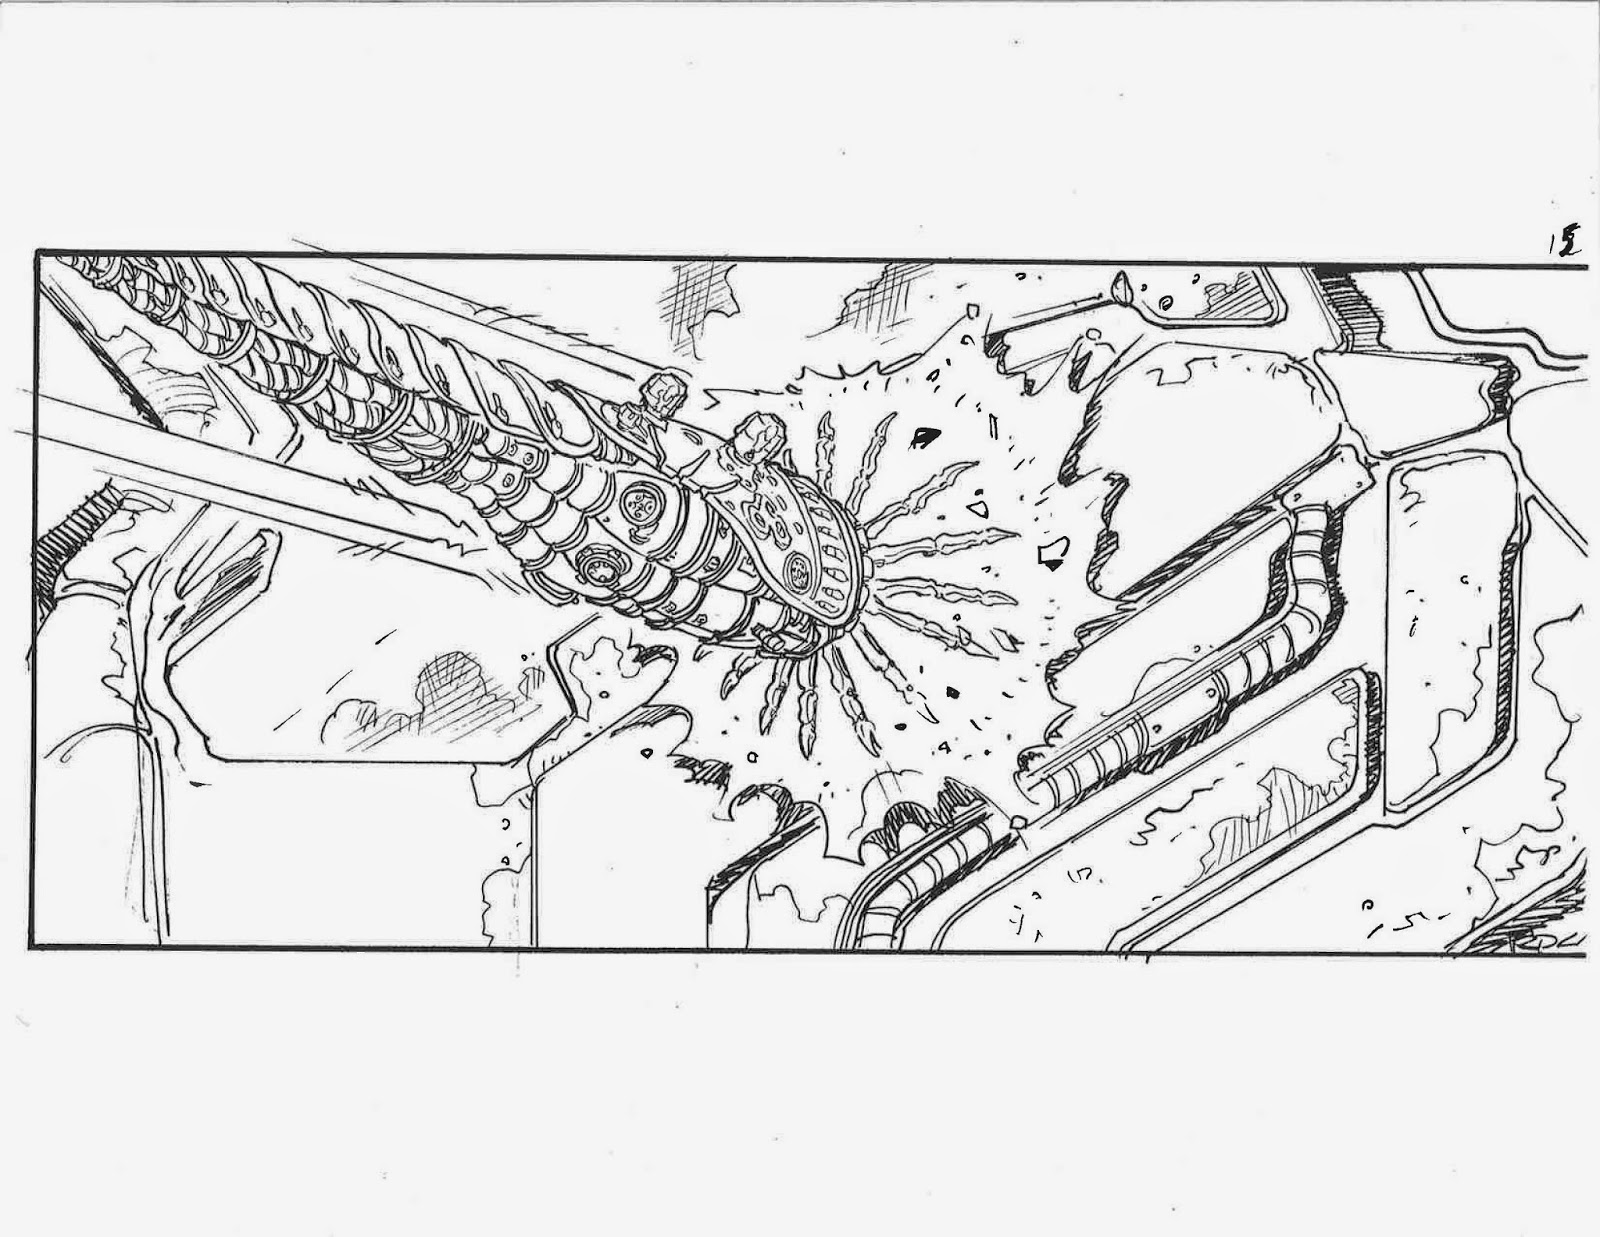 Ricardo Delgado's blog: Matrix storyboards- Bomb hits the ship